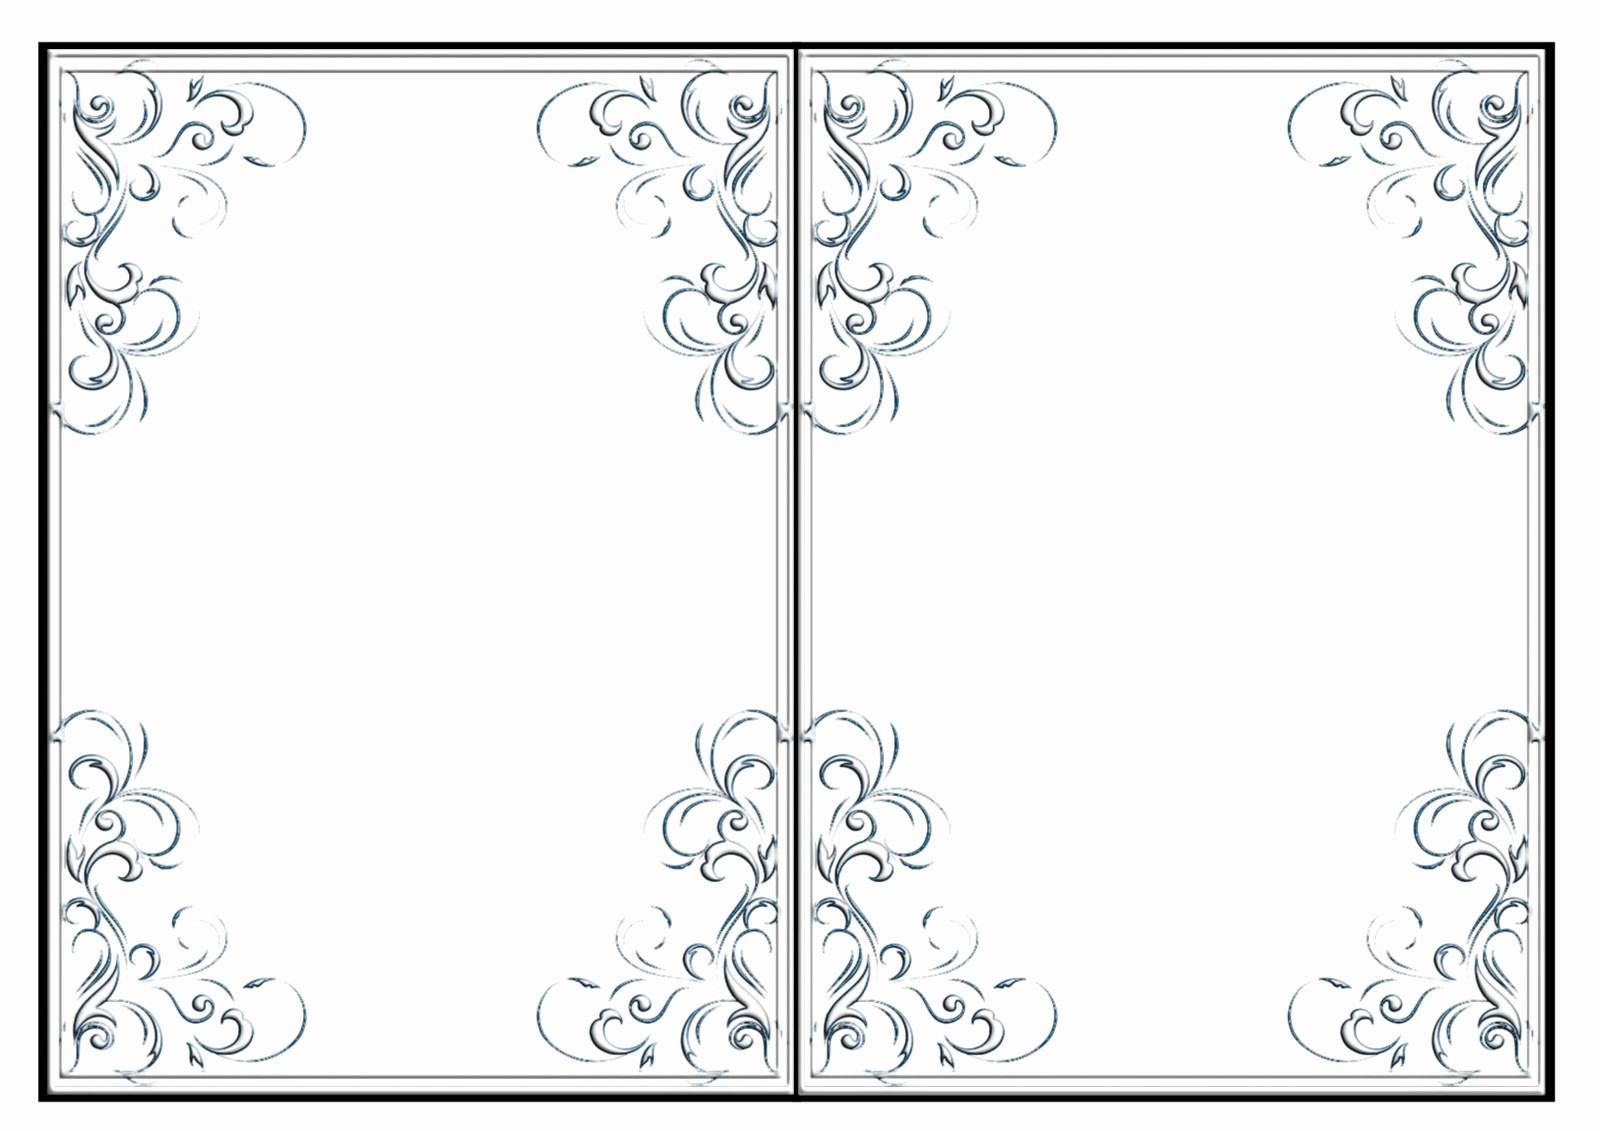 Blank Half Fold Card Template Luxury Blank Half Fold Card Template Microsoft Word Calendar